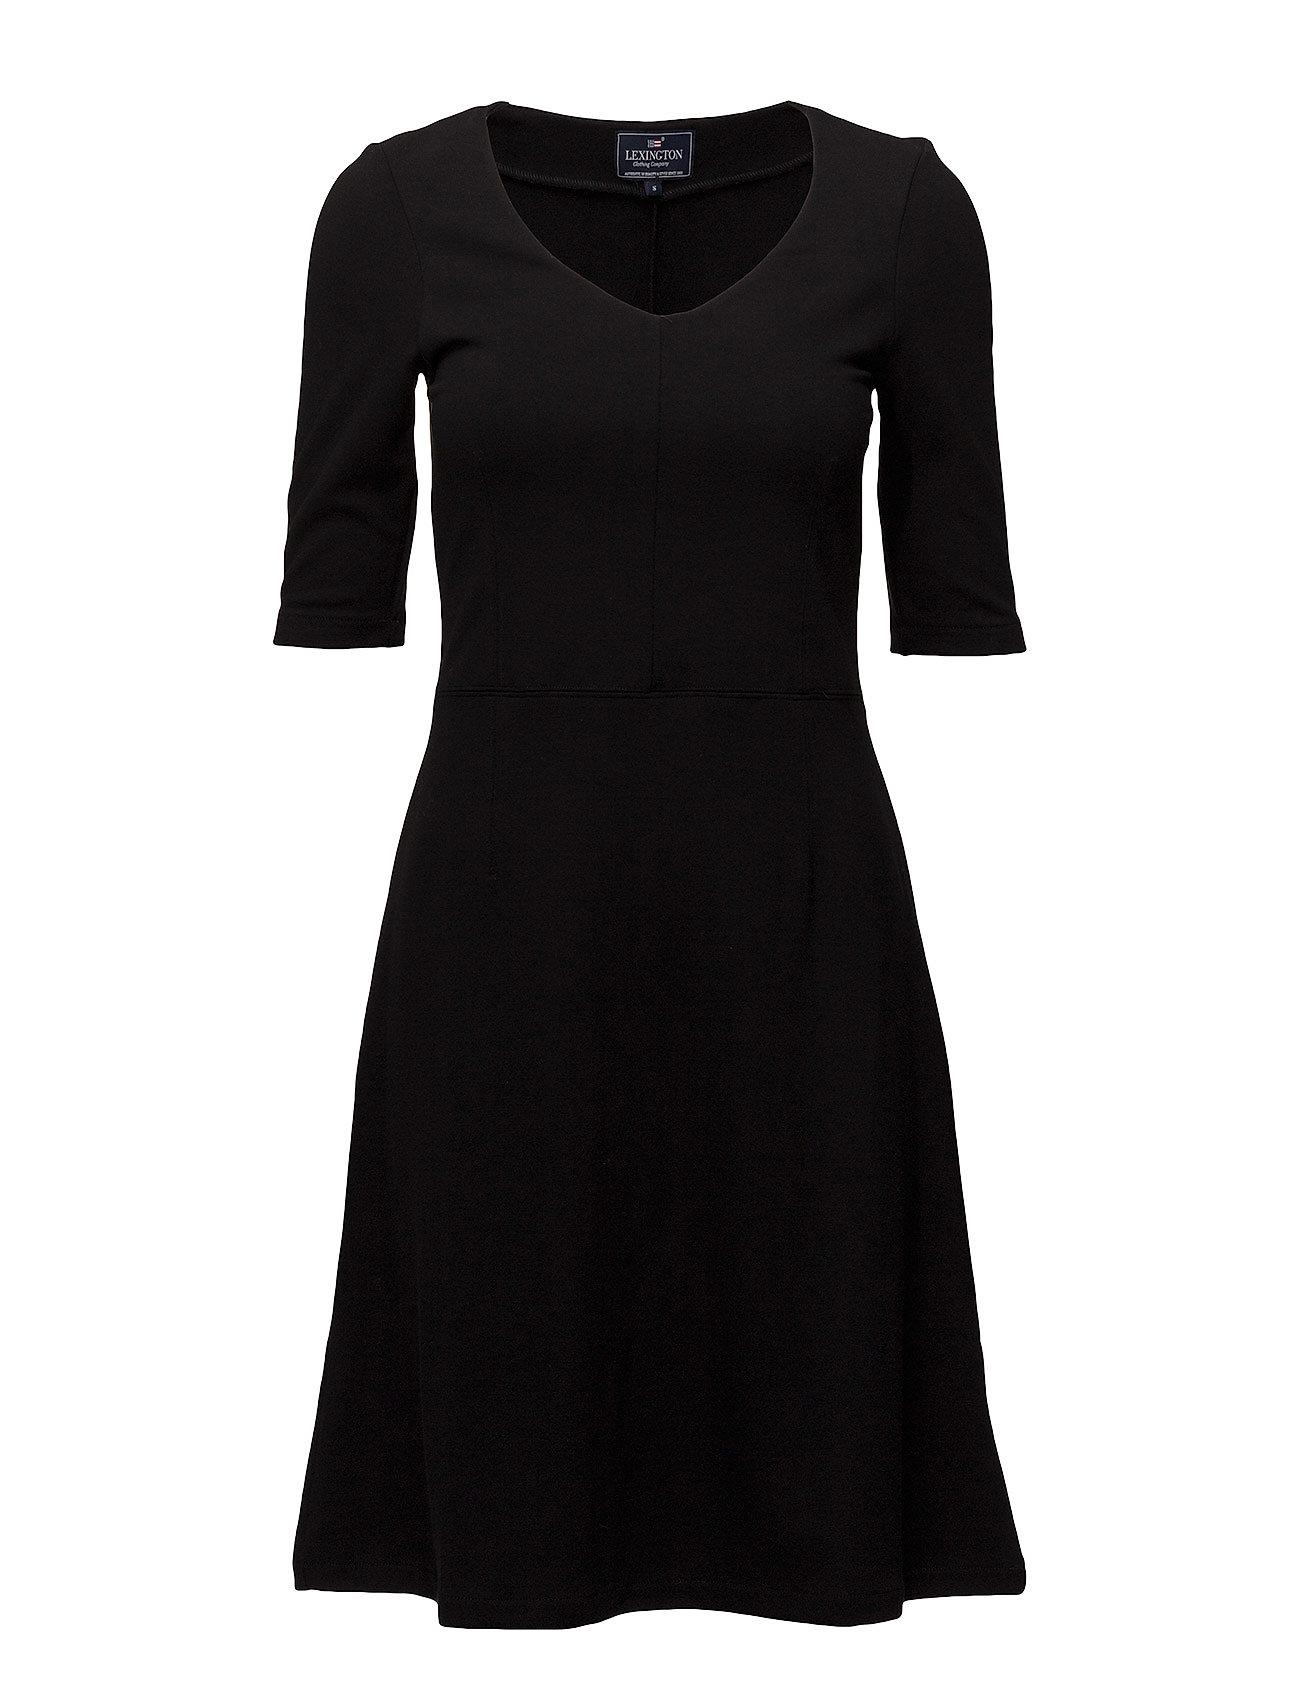 Lexington Clothing Scarlett Jersey Dress - Caviar Black